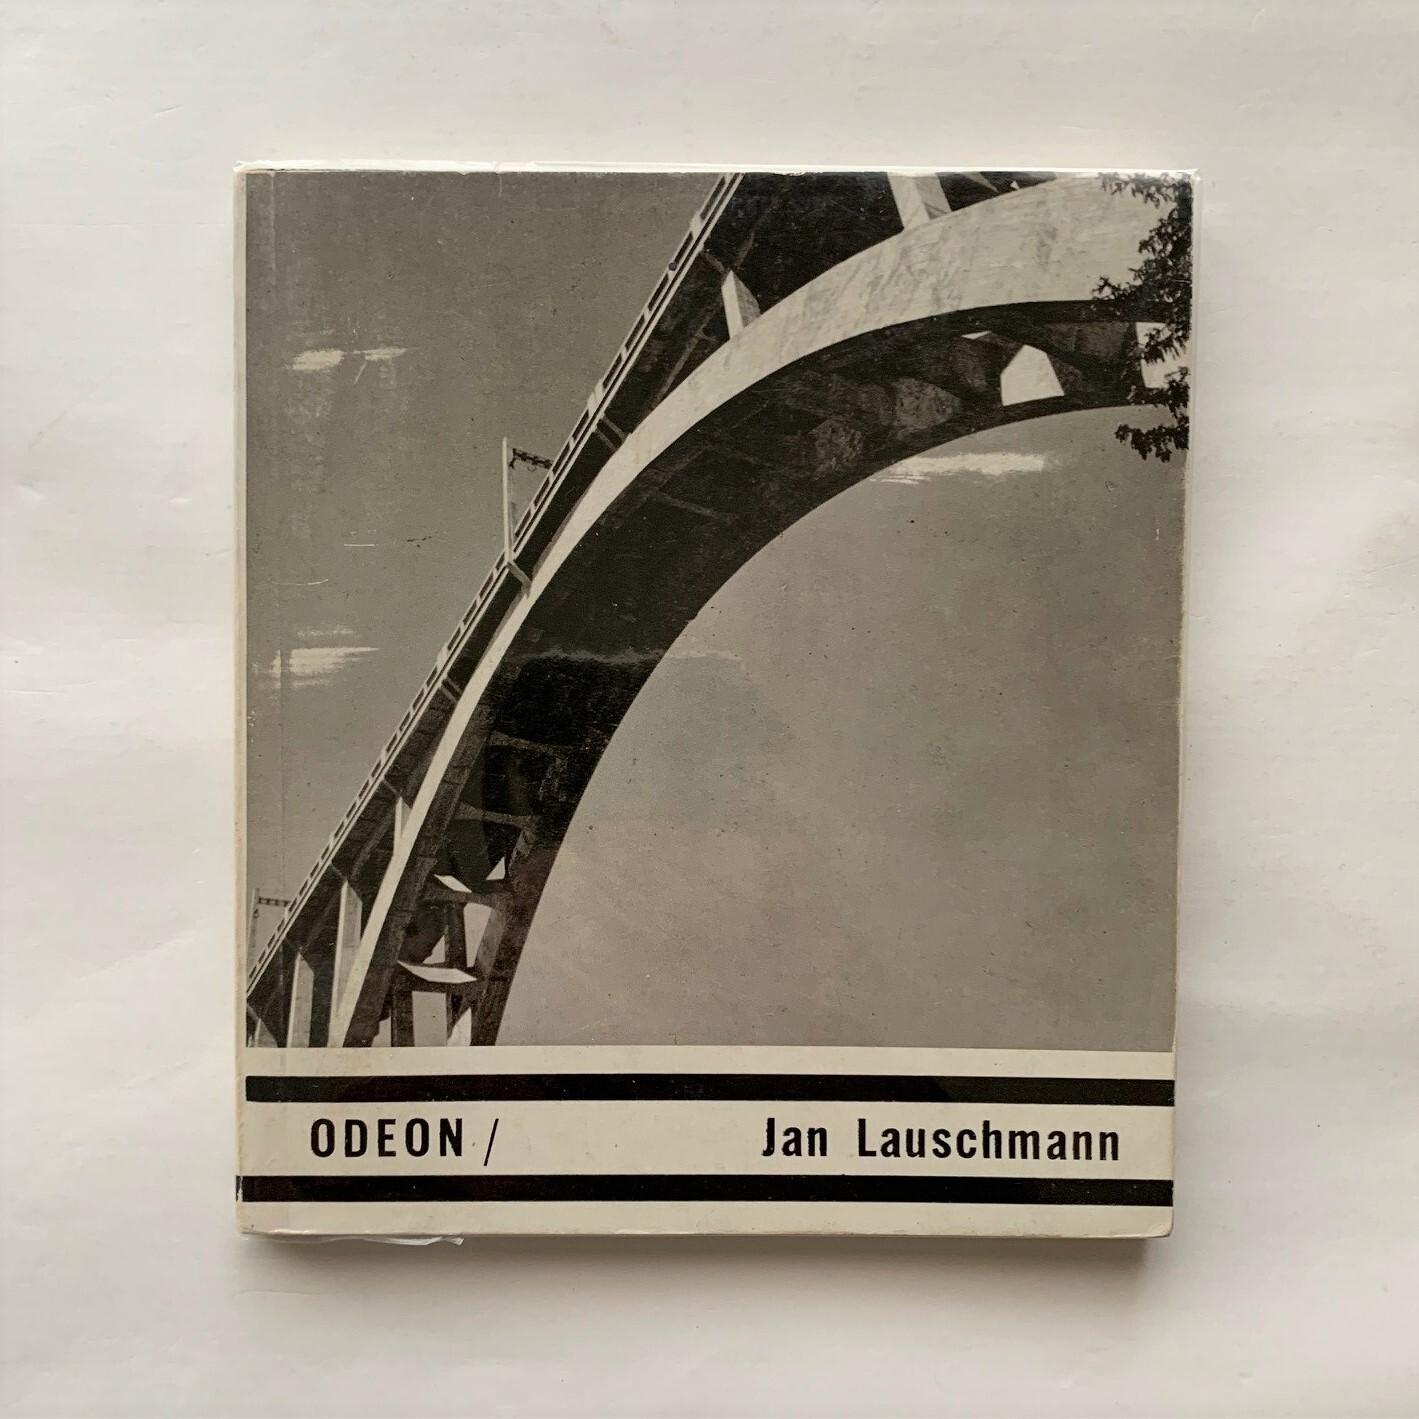 Jan Lauschmann / Umělecká fotografie, sv. 41 / Daniela Mrázková